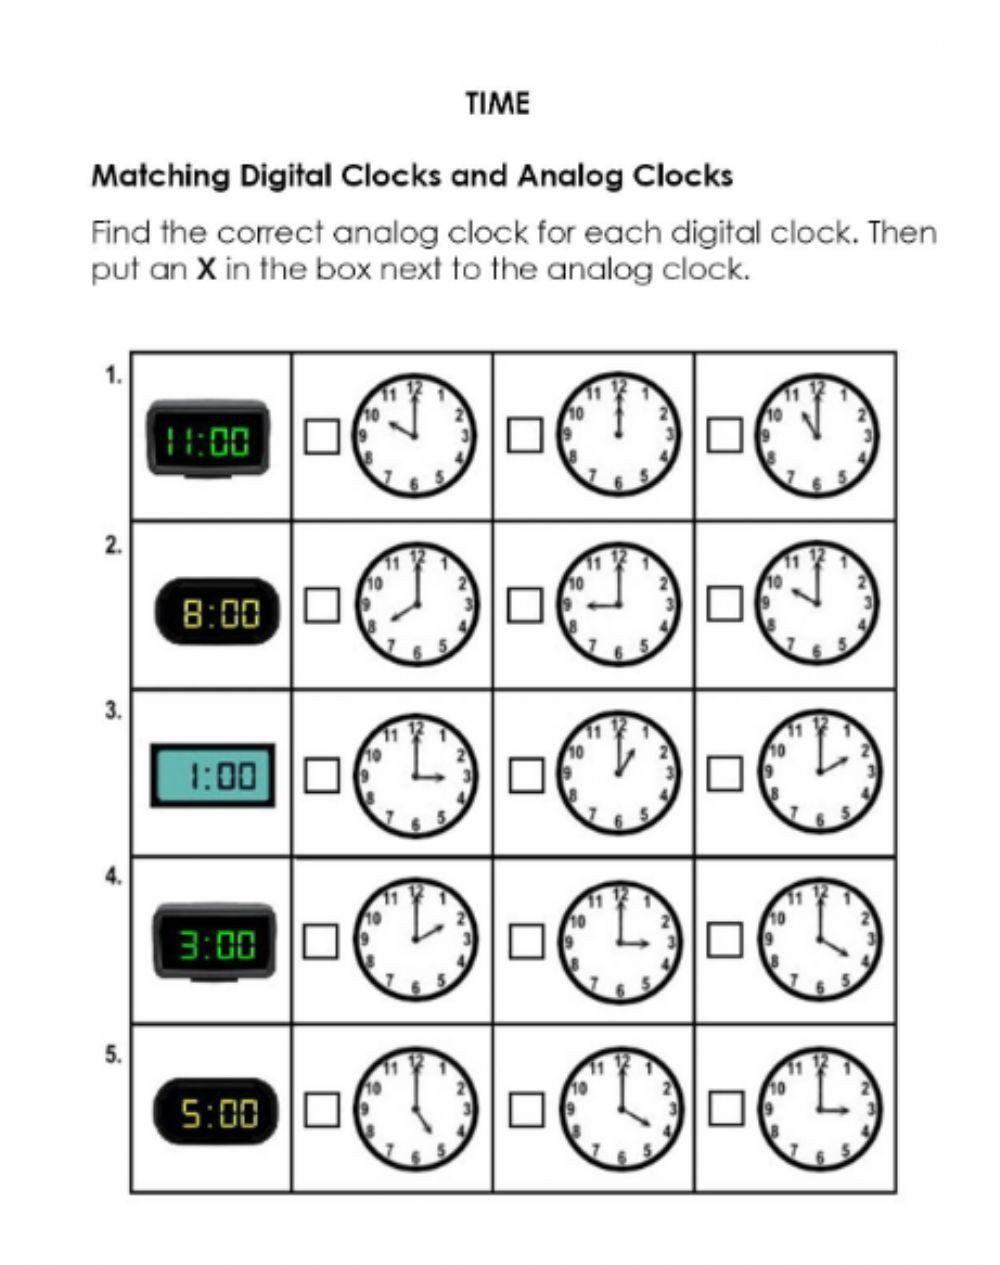 small resolution of Analogue and Digital Clock Worksheets Match Digital and Analog Clocks  Interactive Worksheet   Clock worksheets